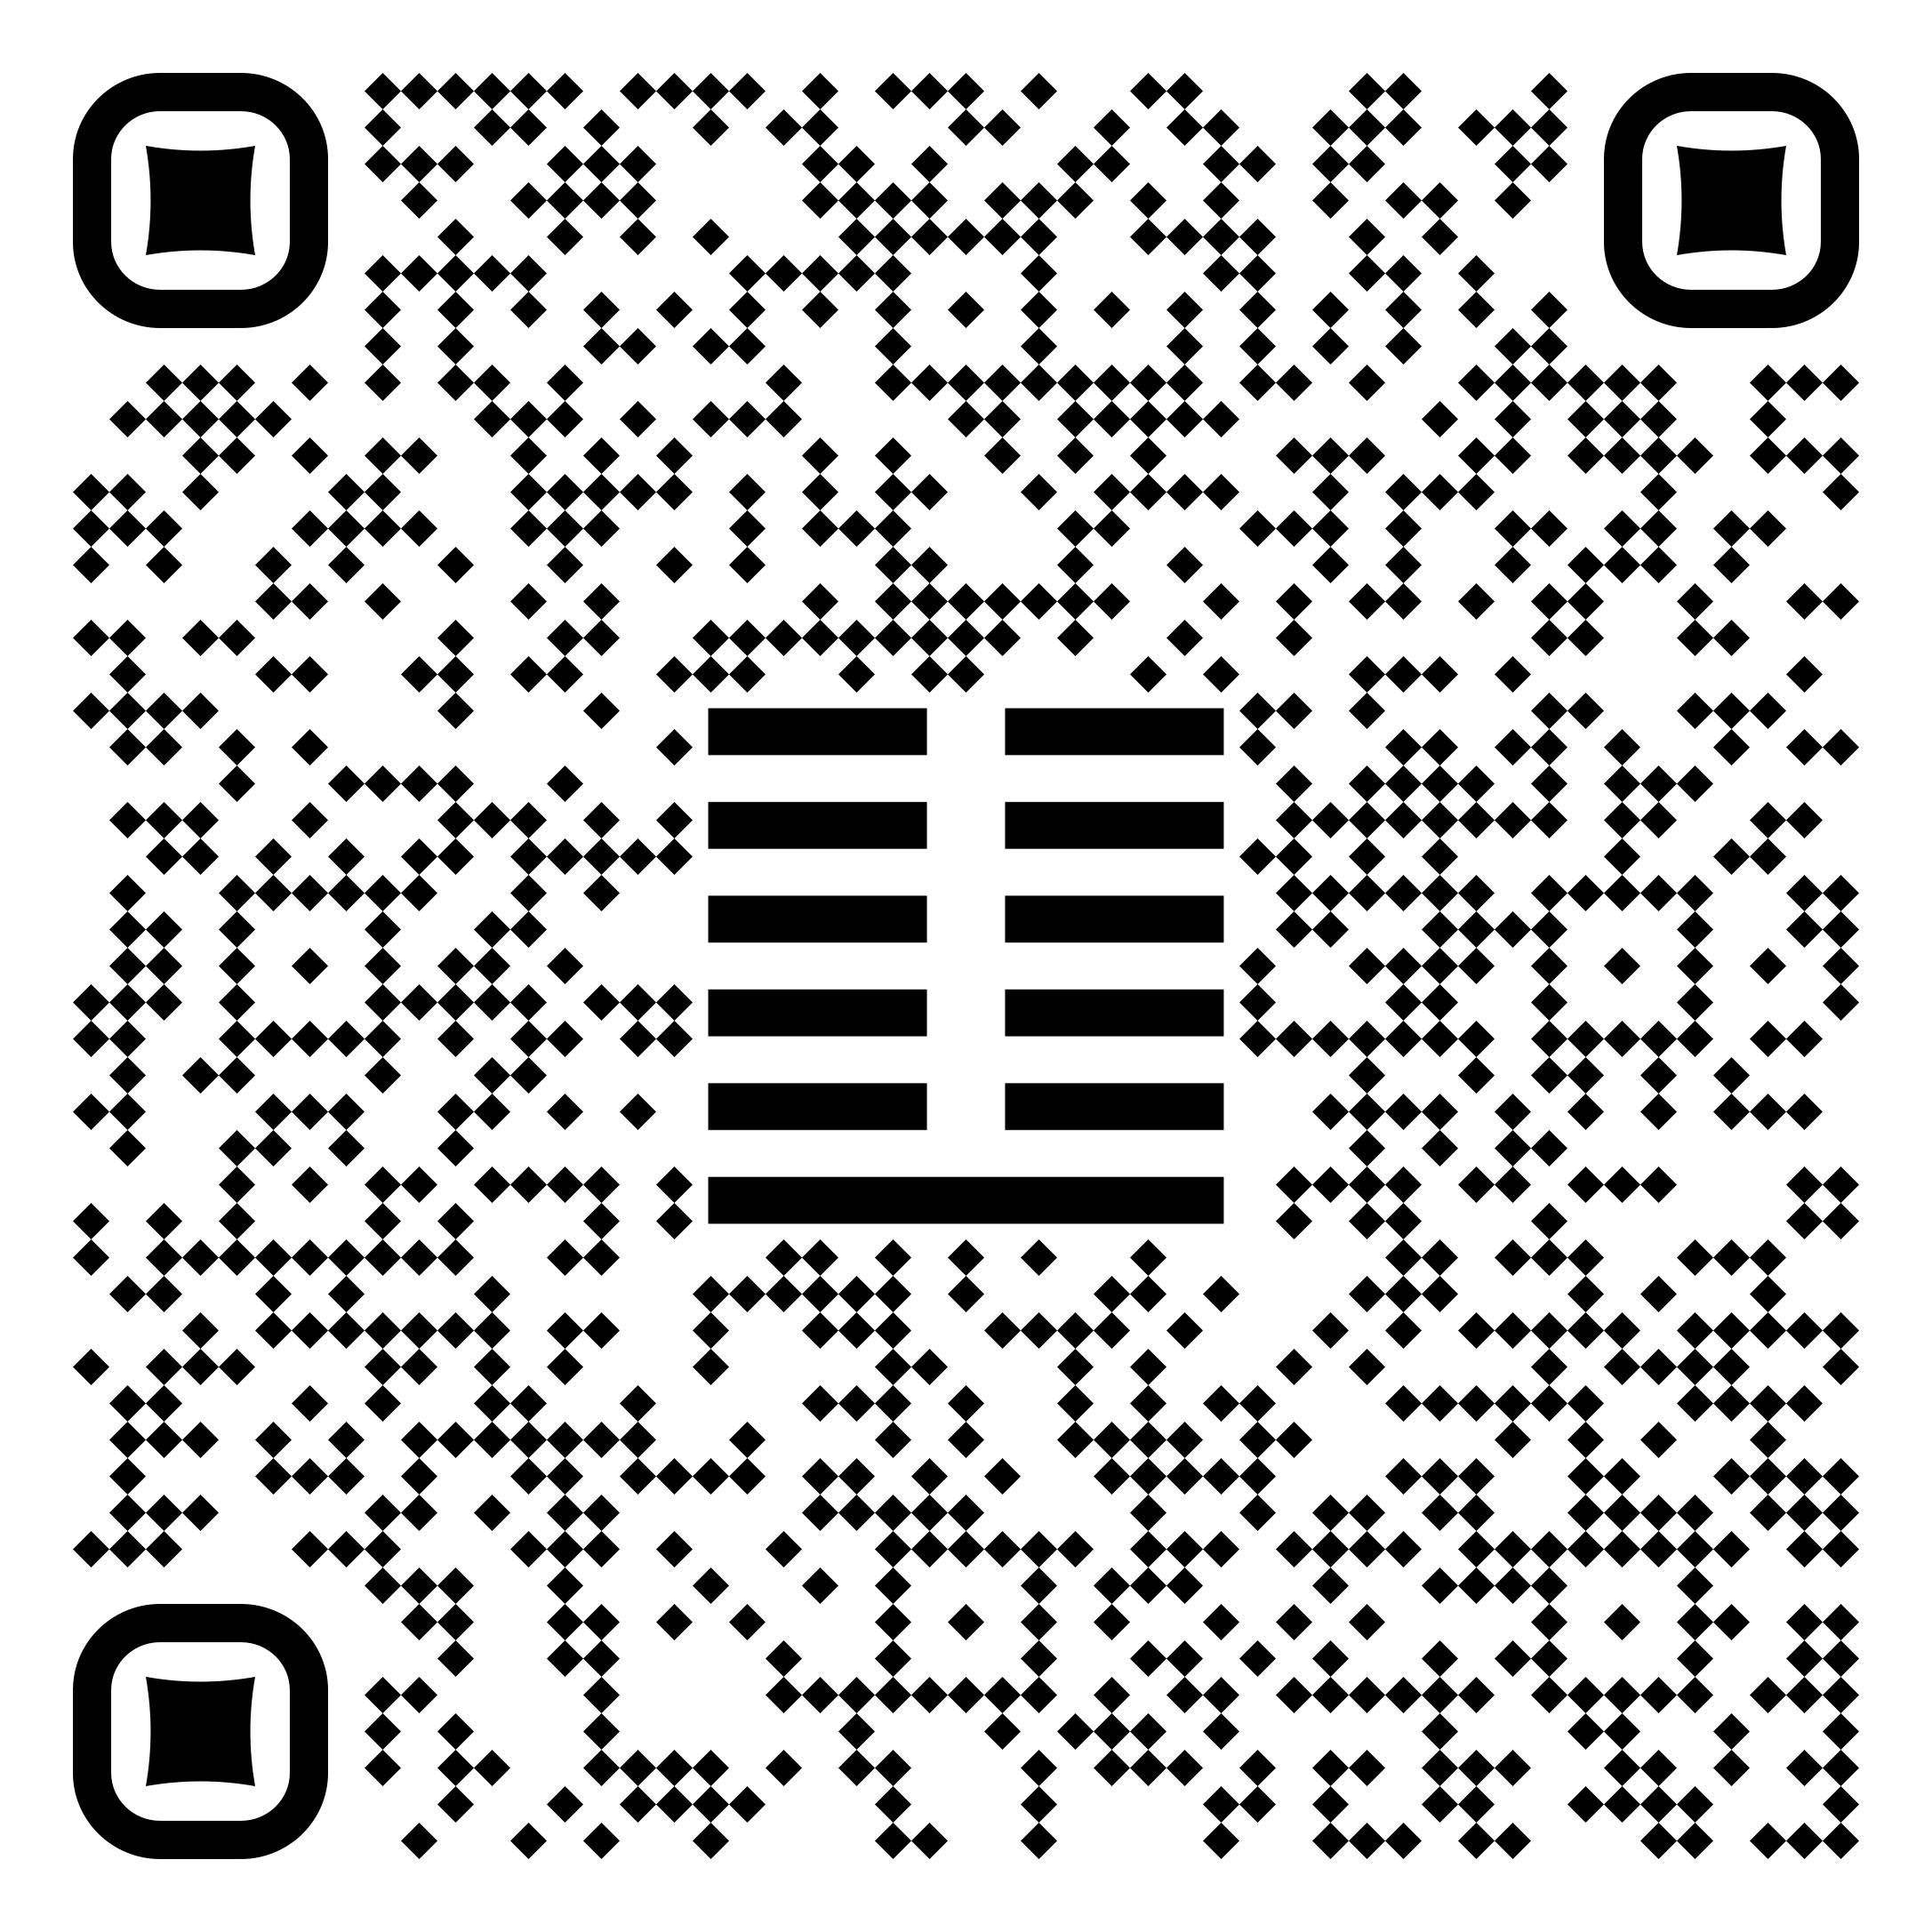 qr-code-24.png